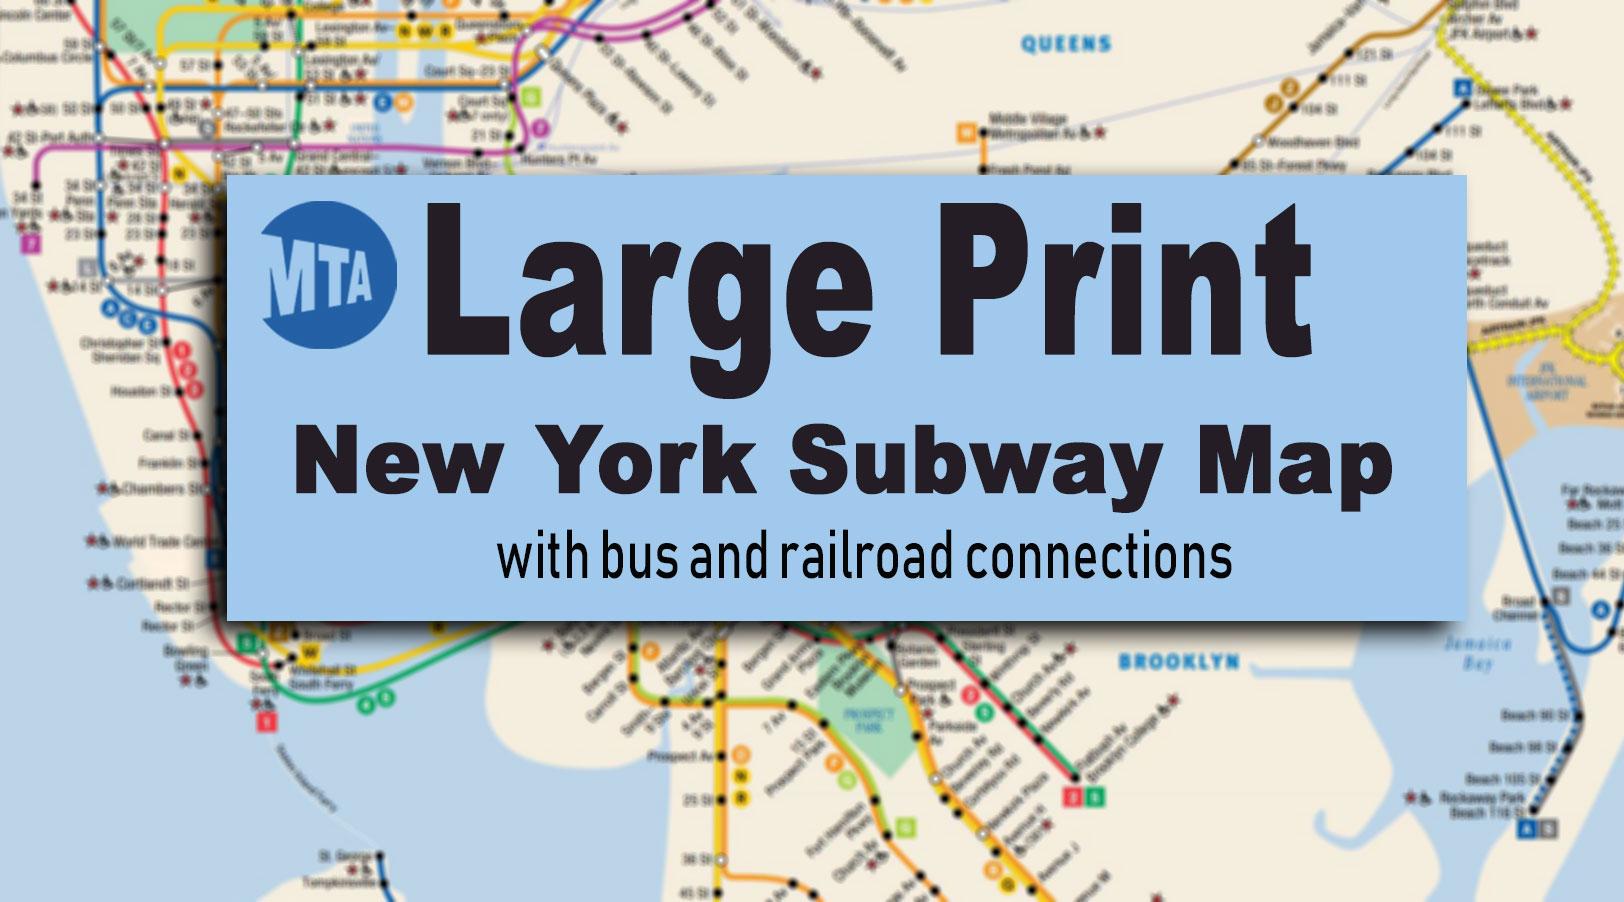 New York City Subway Map For Large Print Viewing And Printing - Printable Nyc Subway Map